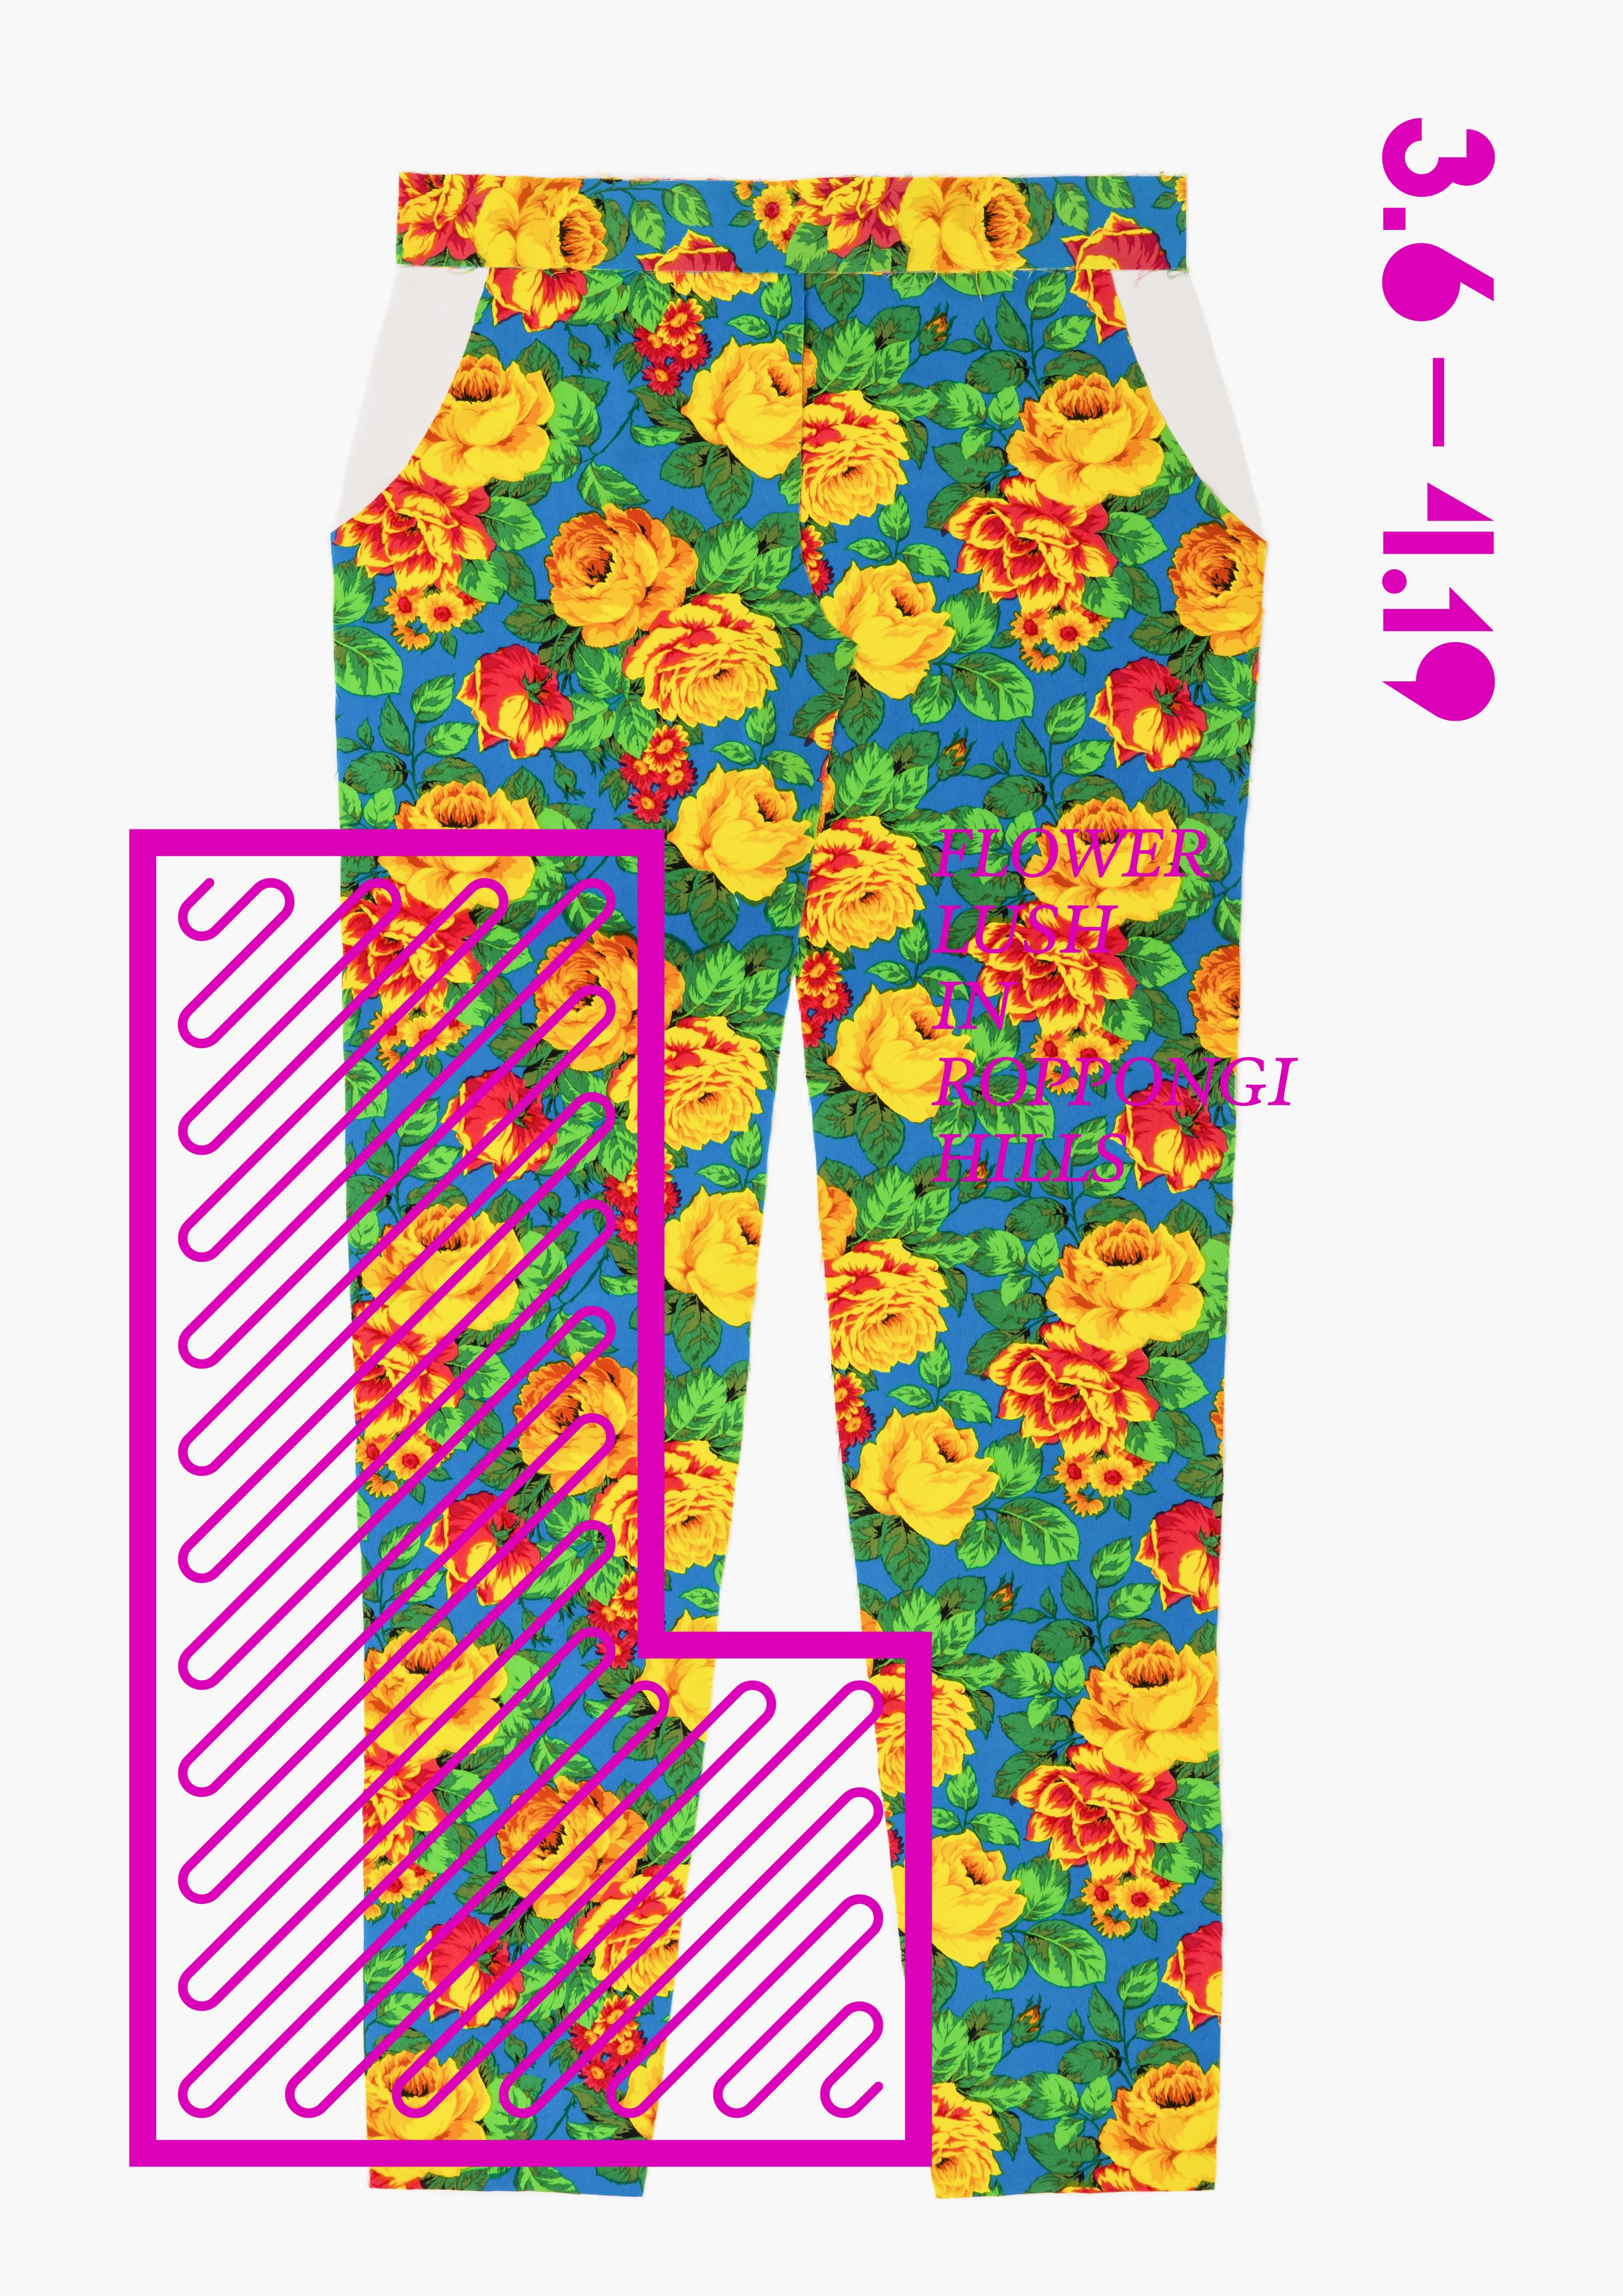 FLOWER_LUSH_L2_RGB_L